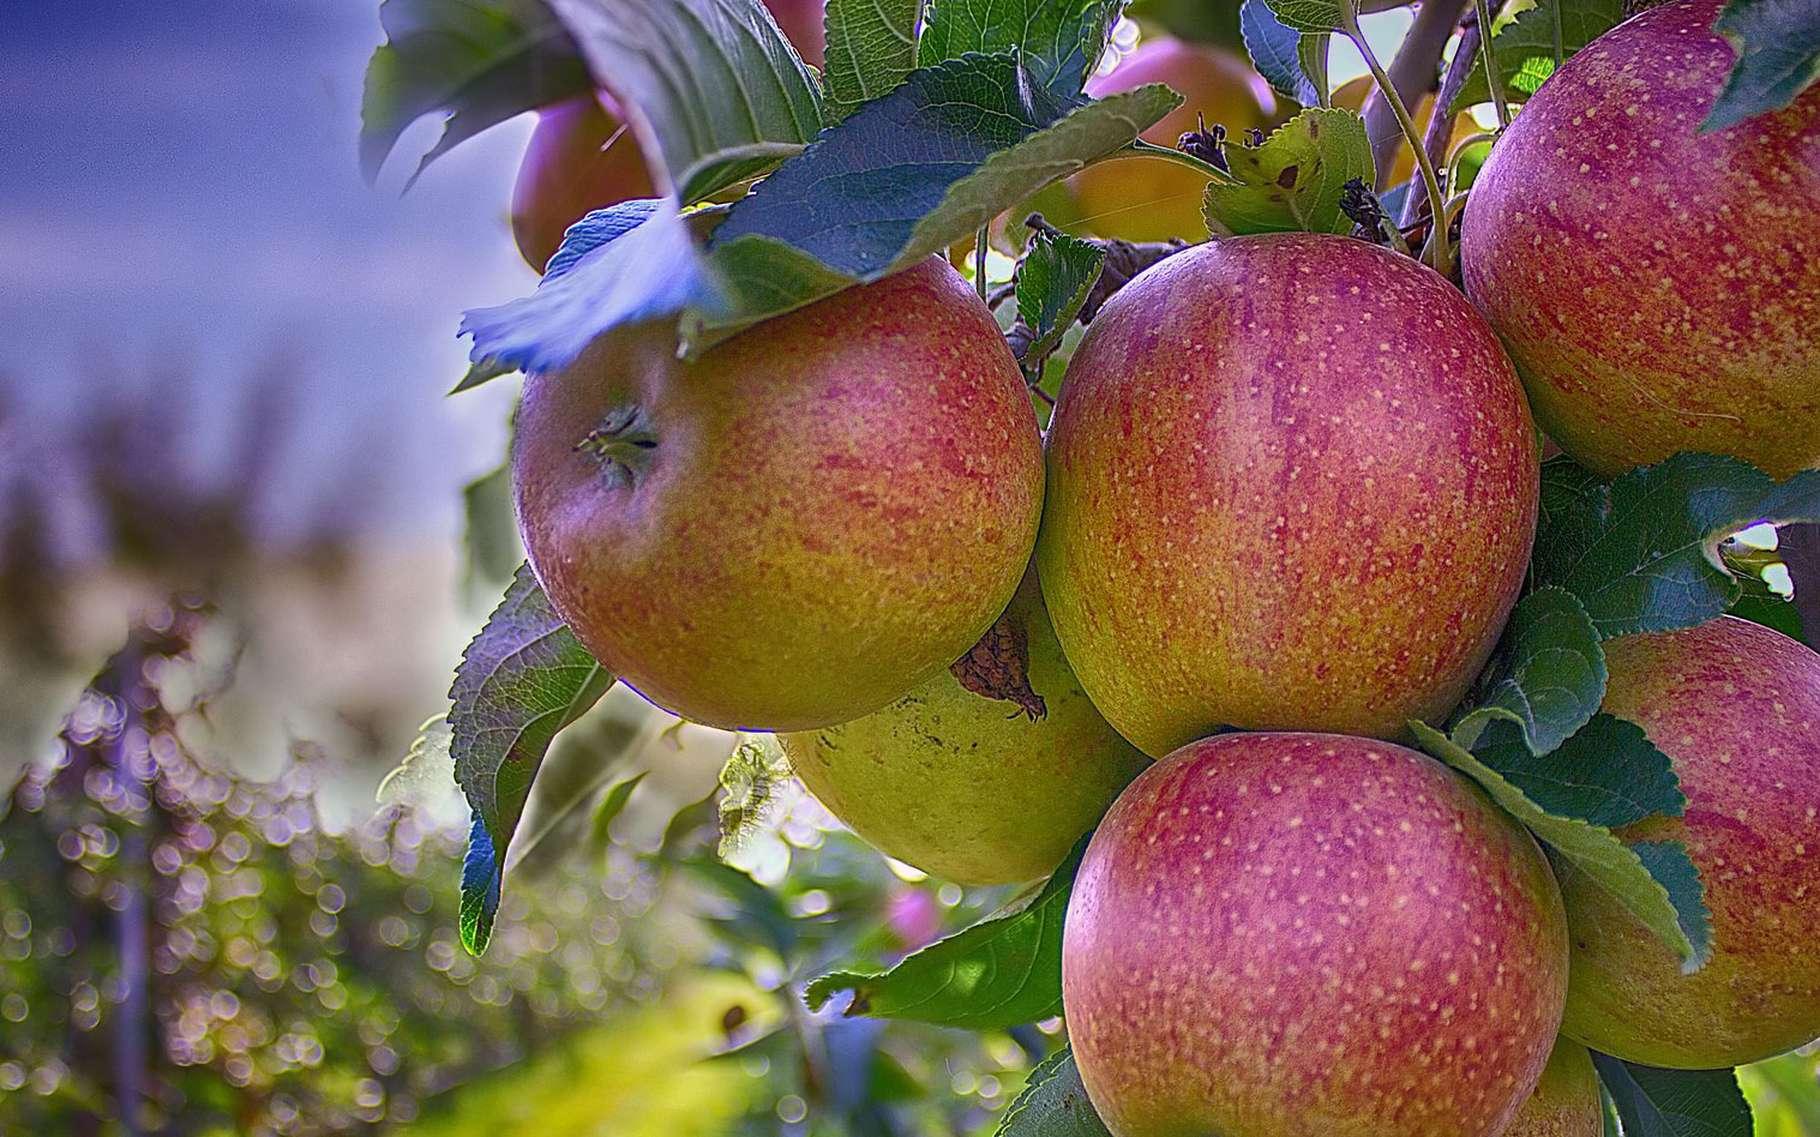 Délicieuses pommes rouges du verger. © MarcoRoosink, Pixabay, DP